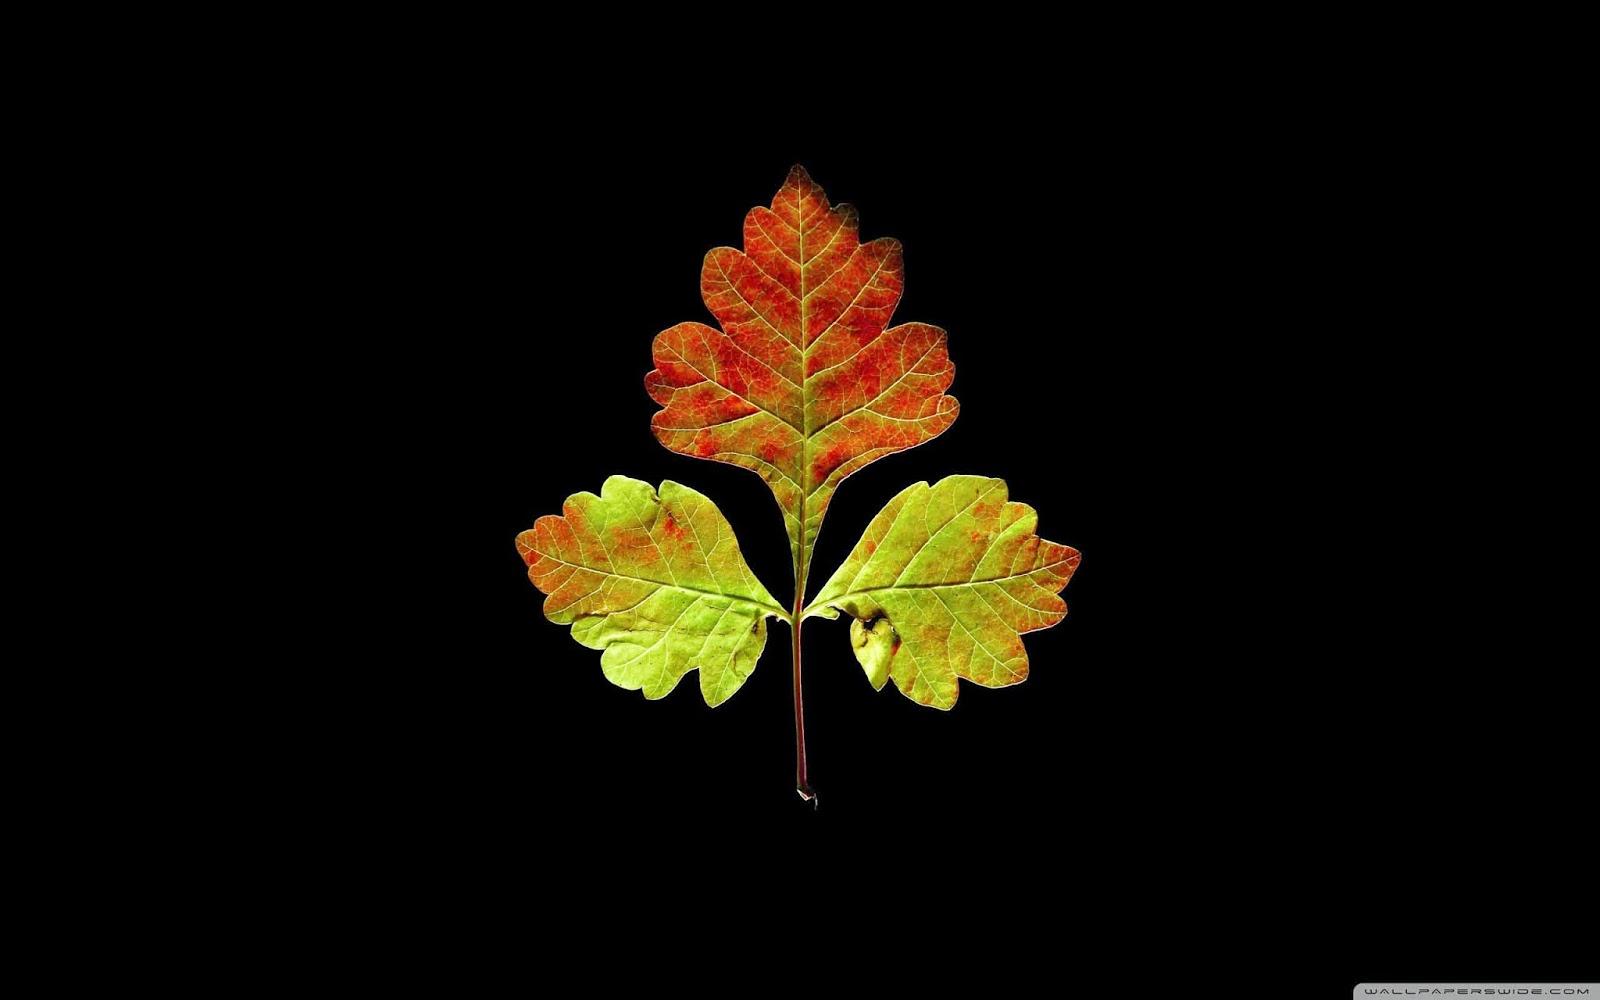 autumn beauty wallpaper